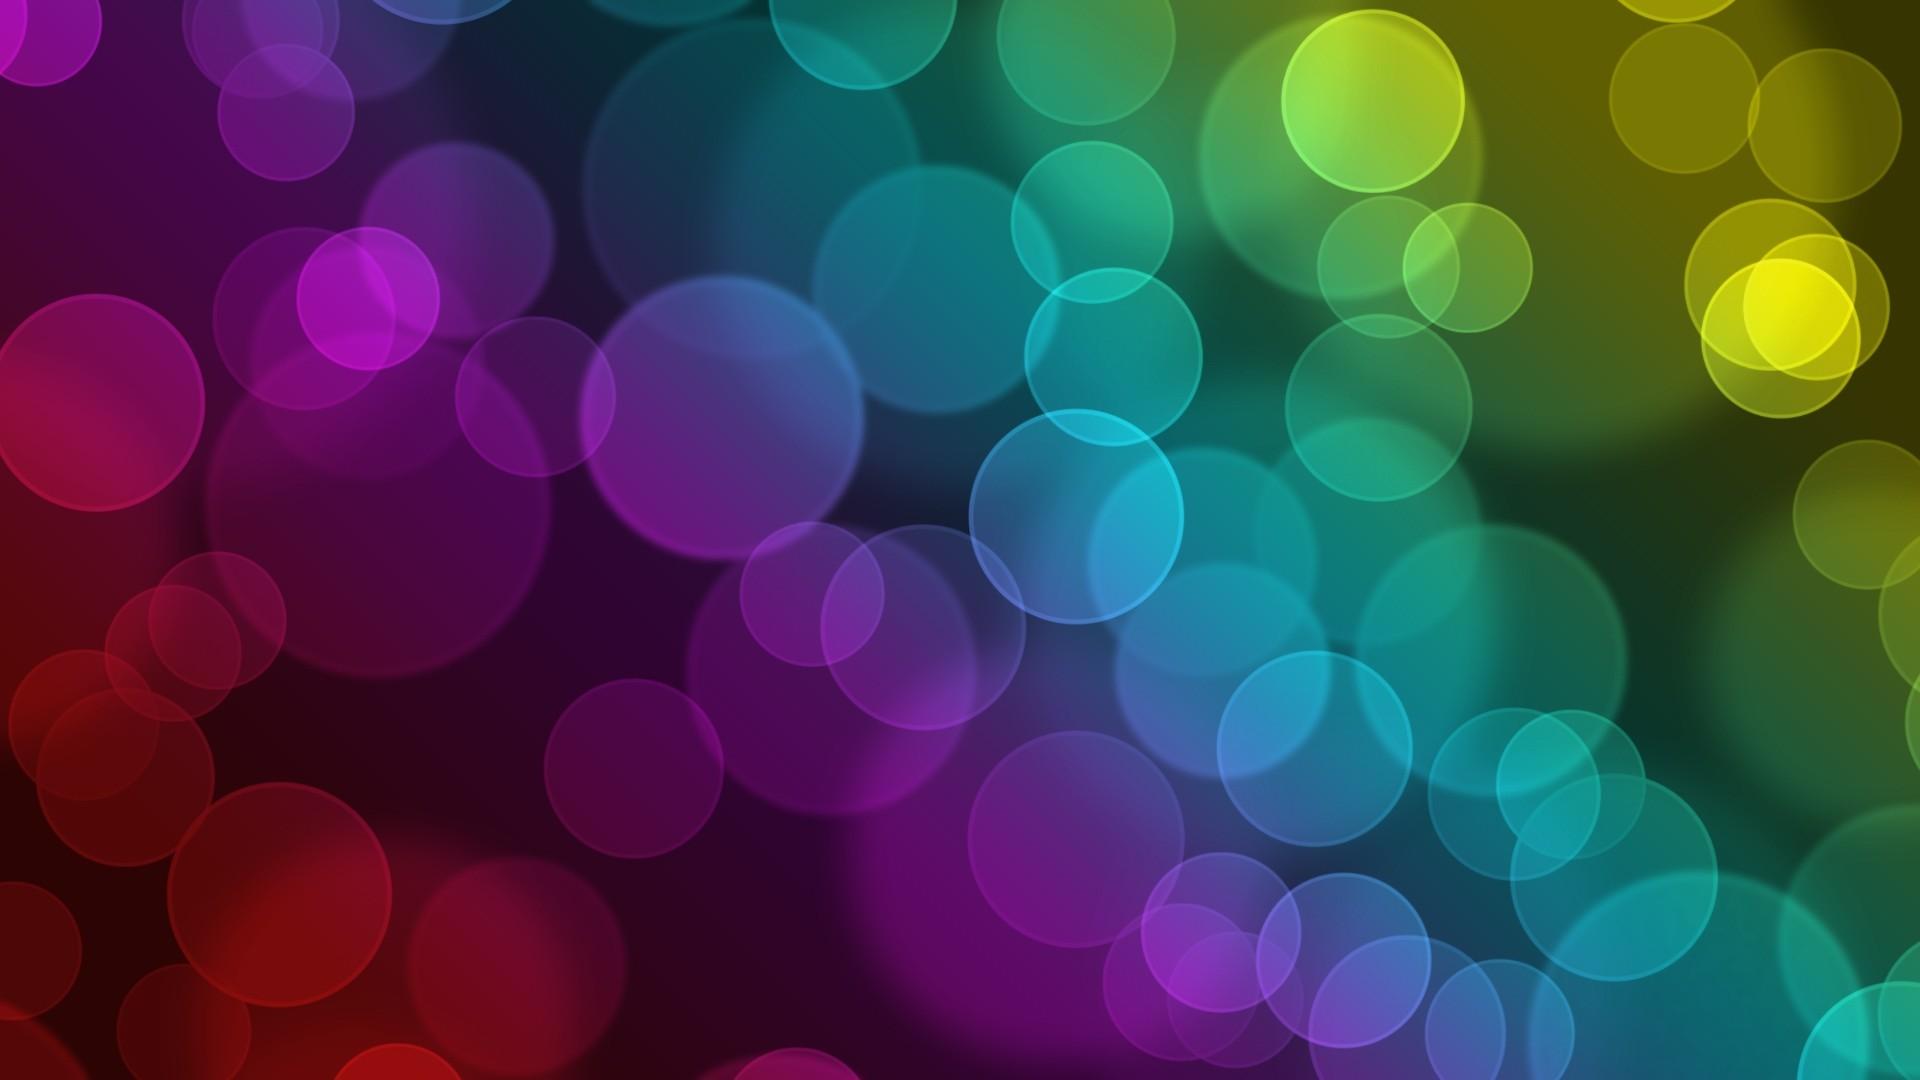 Wallpaper Flashing, Colorful, Circles, Dark, Shadow